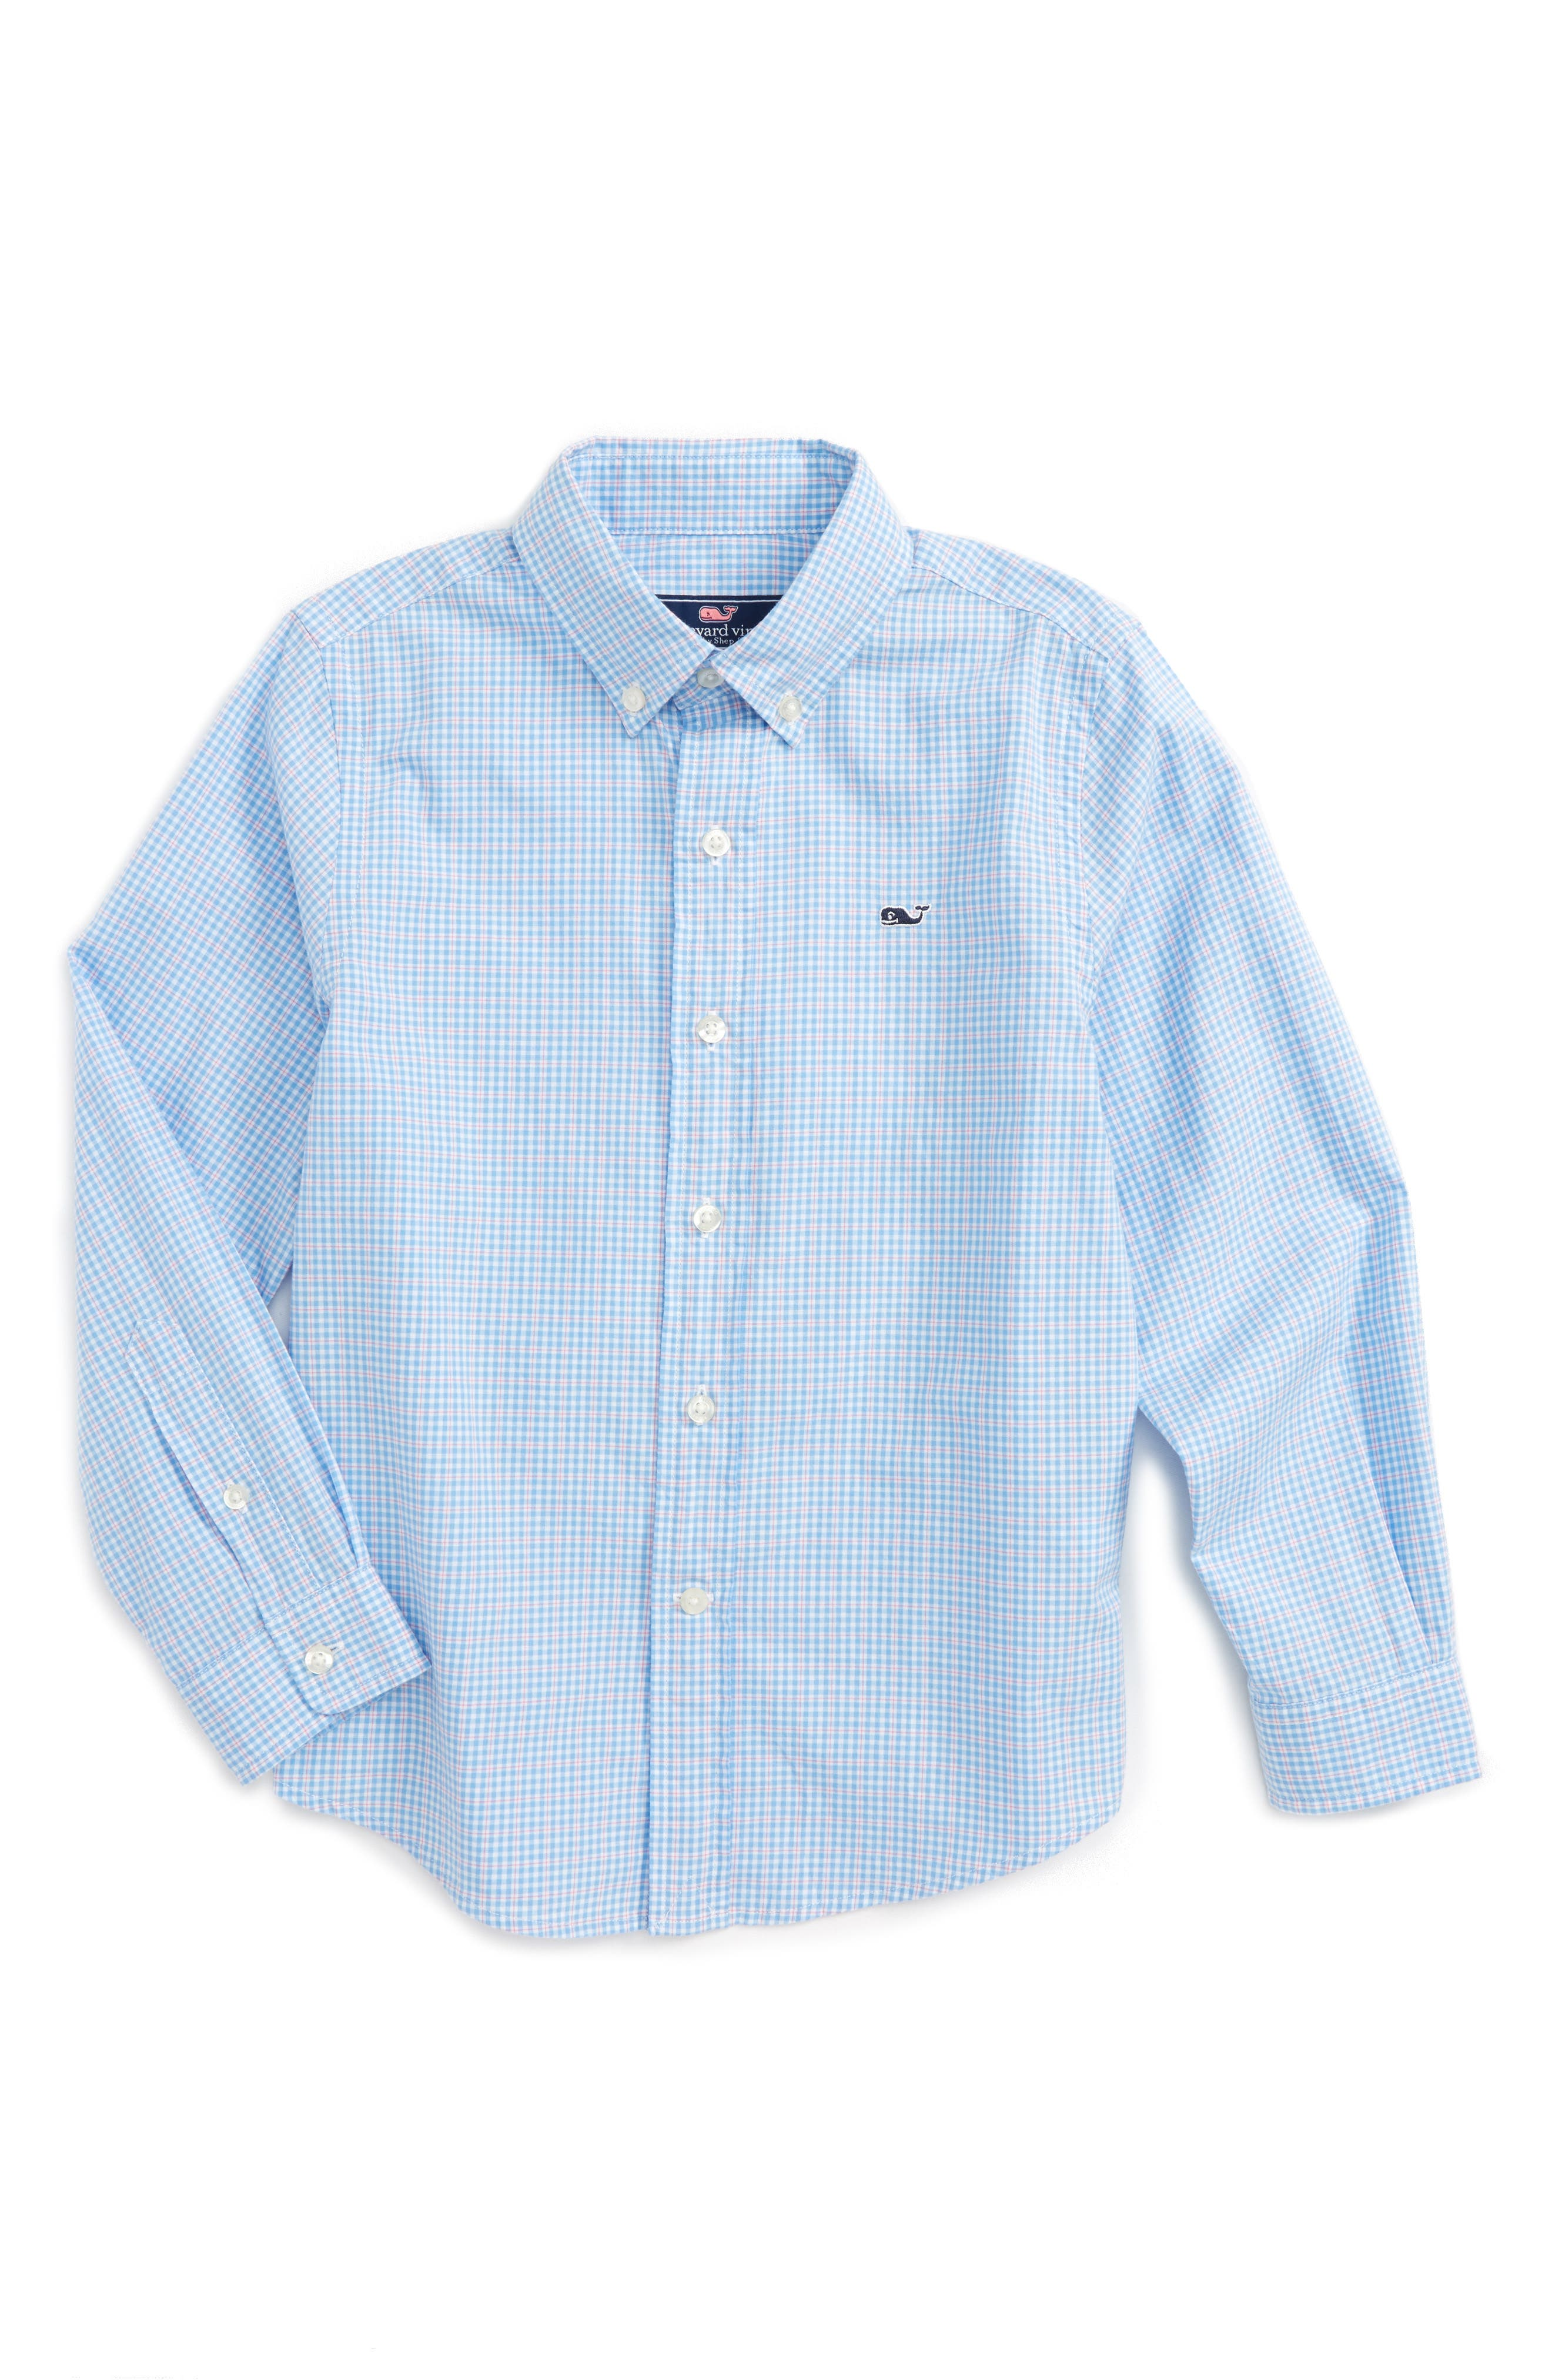 Vineyard Vines Stowaway Plaid Shirt (Toddler Boys, Little Boys & Big Boys)